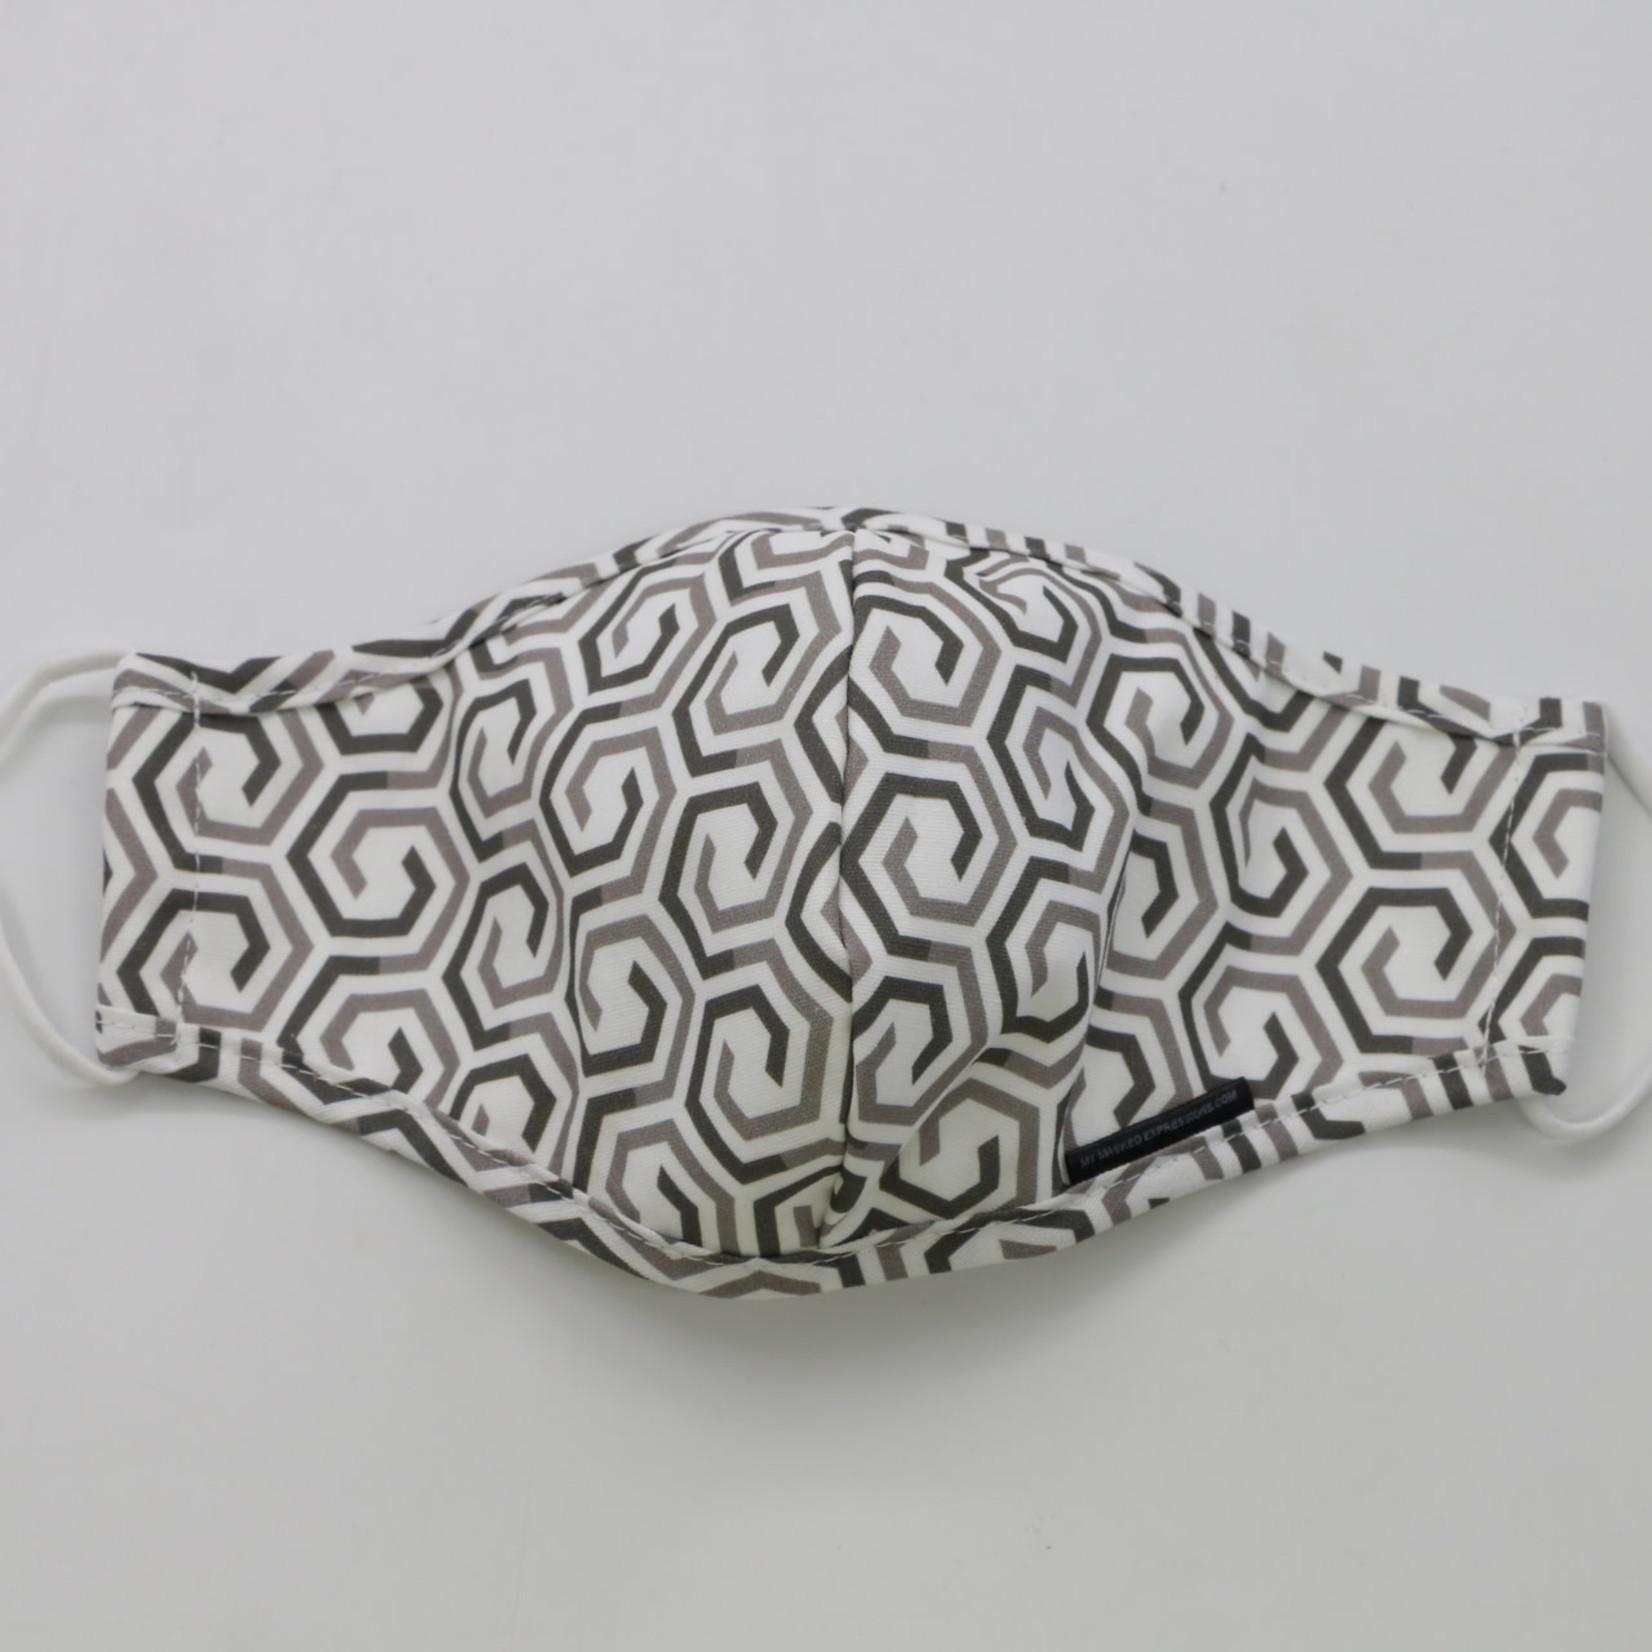 My Masked Expressions Adult Size Mask, Greyscale Honeycomb